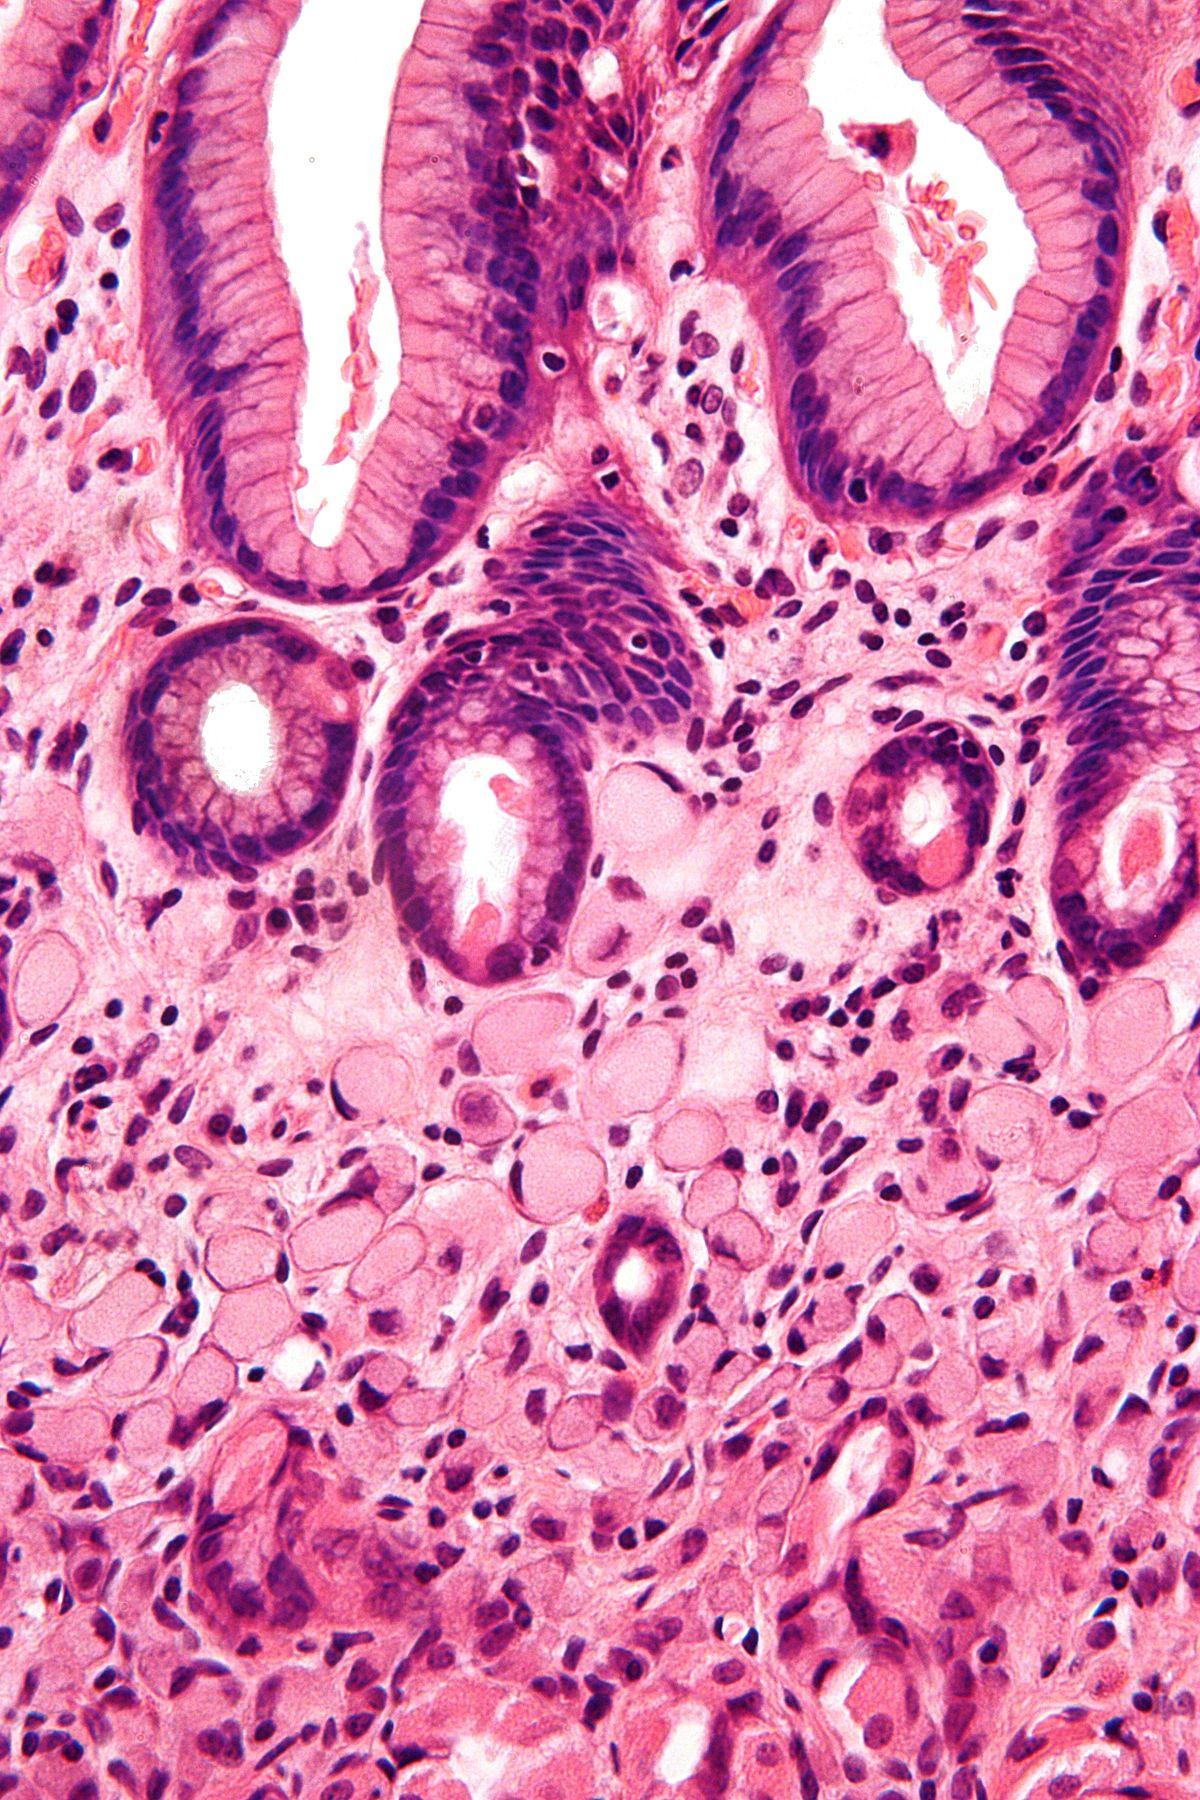 abdominal cancer cells